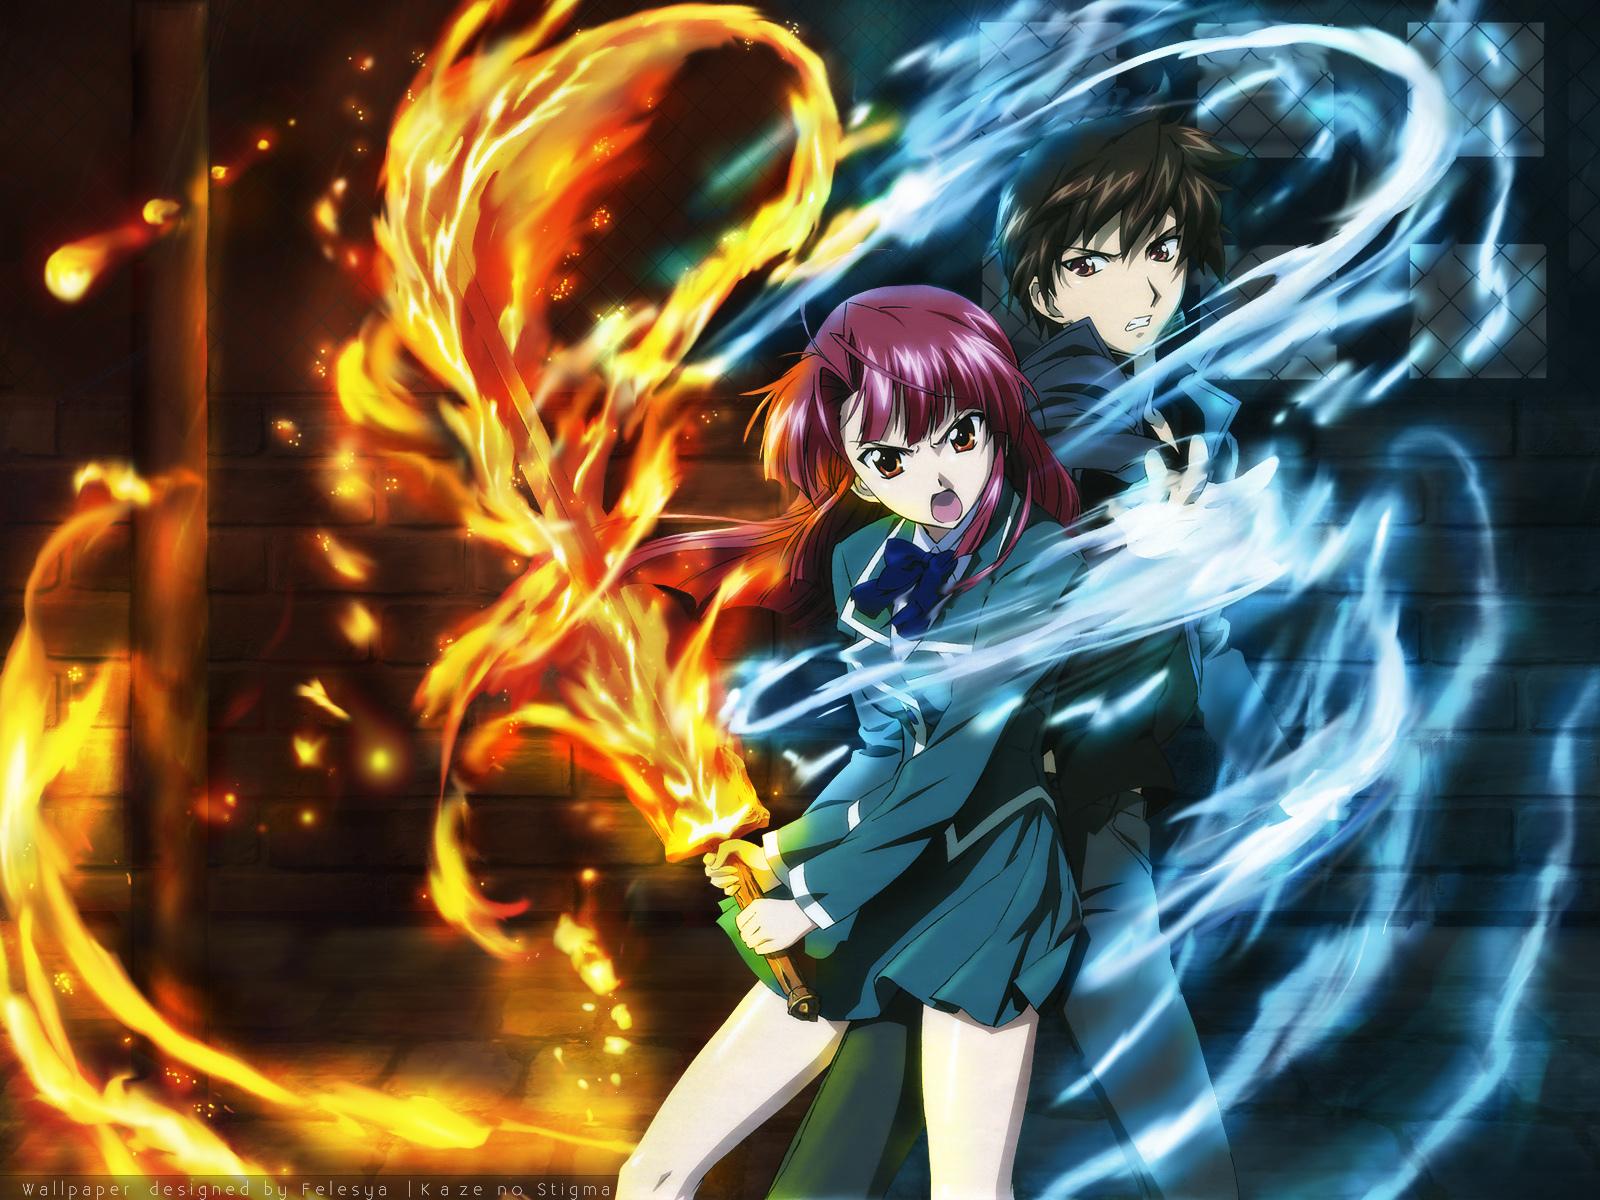 fire sword: